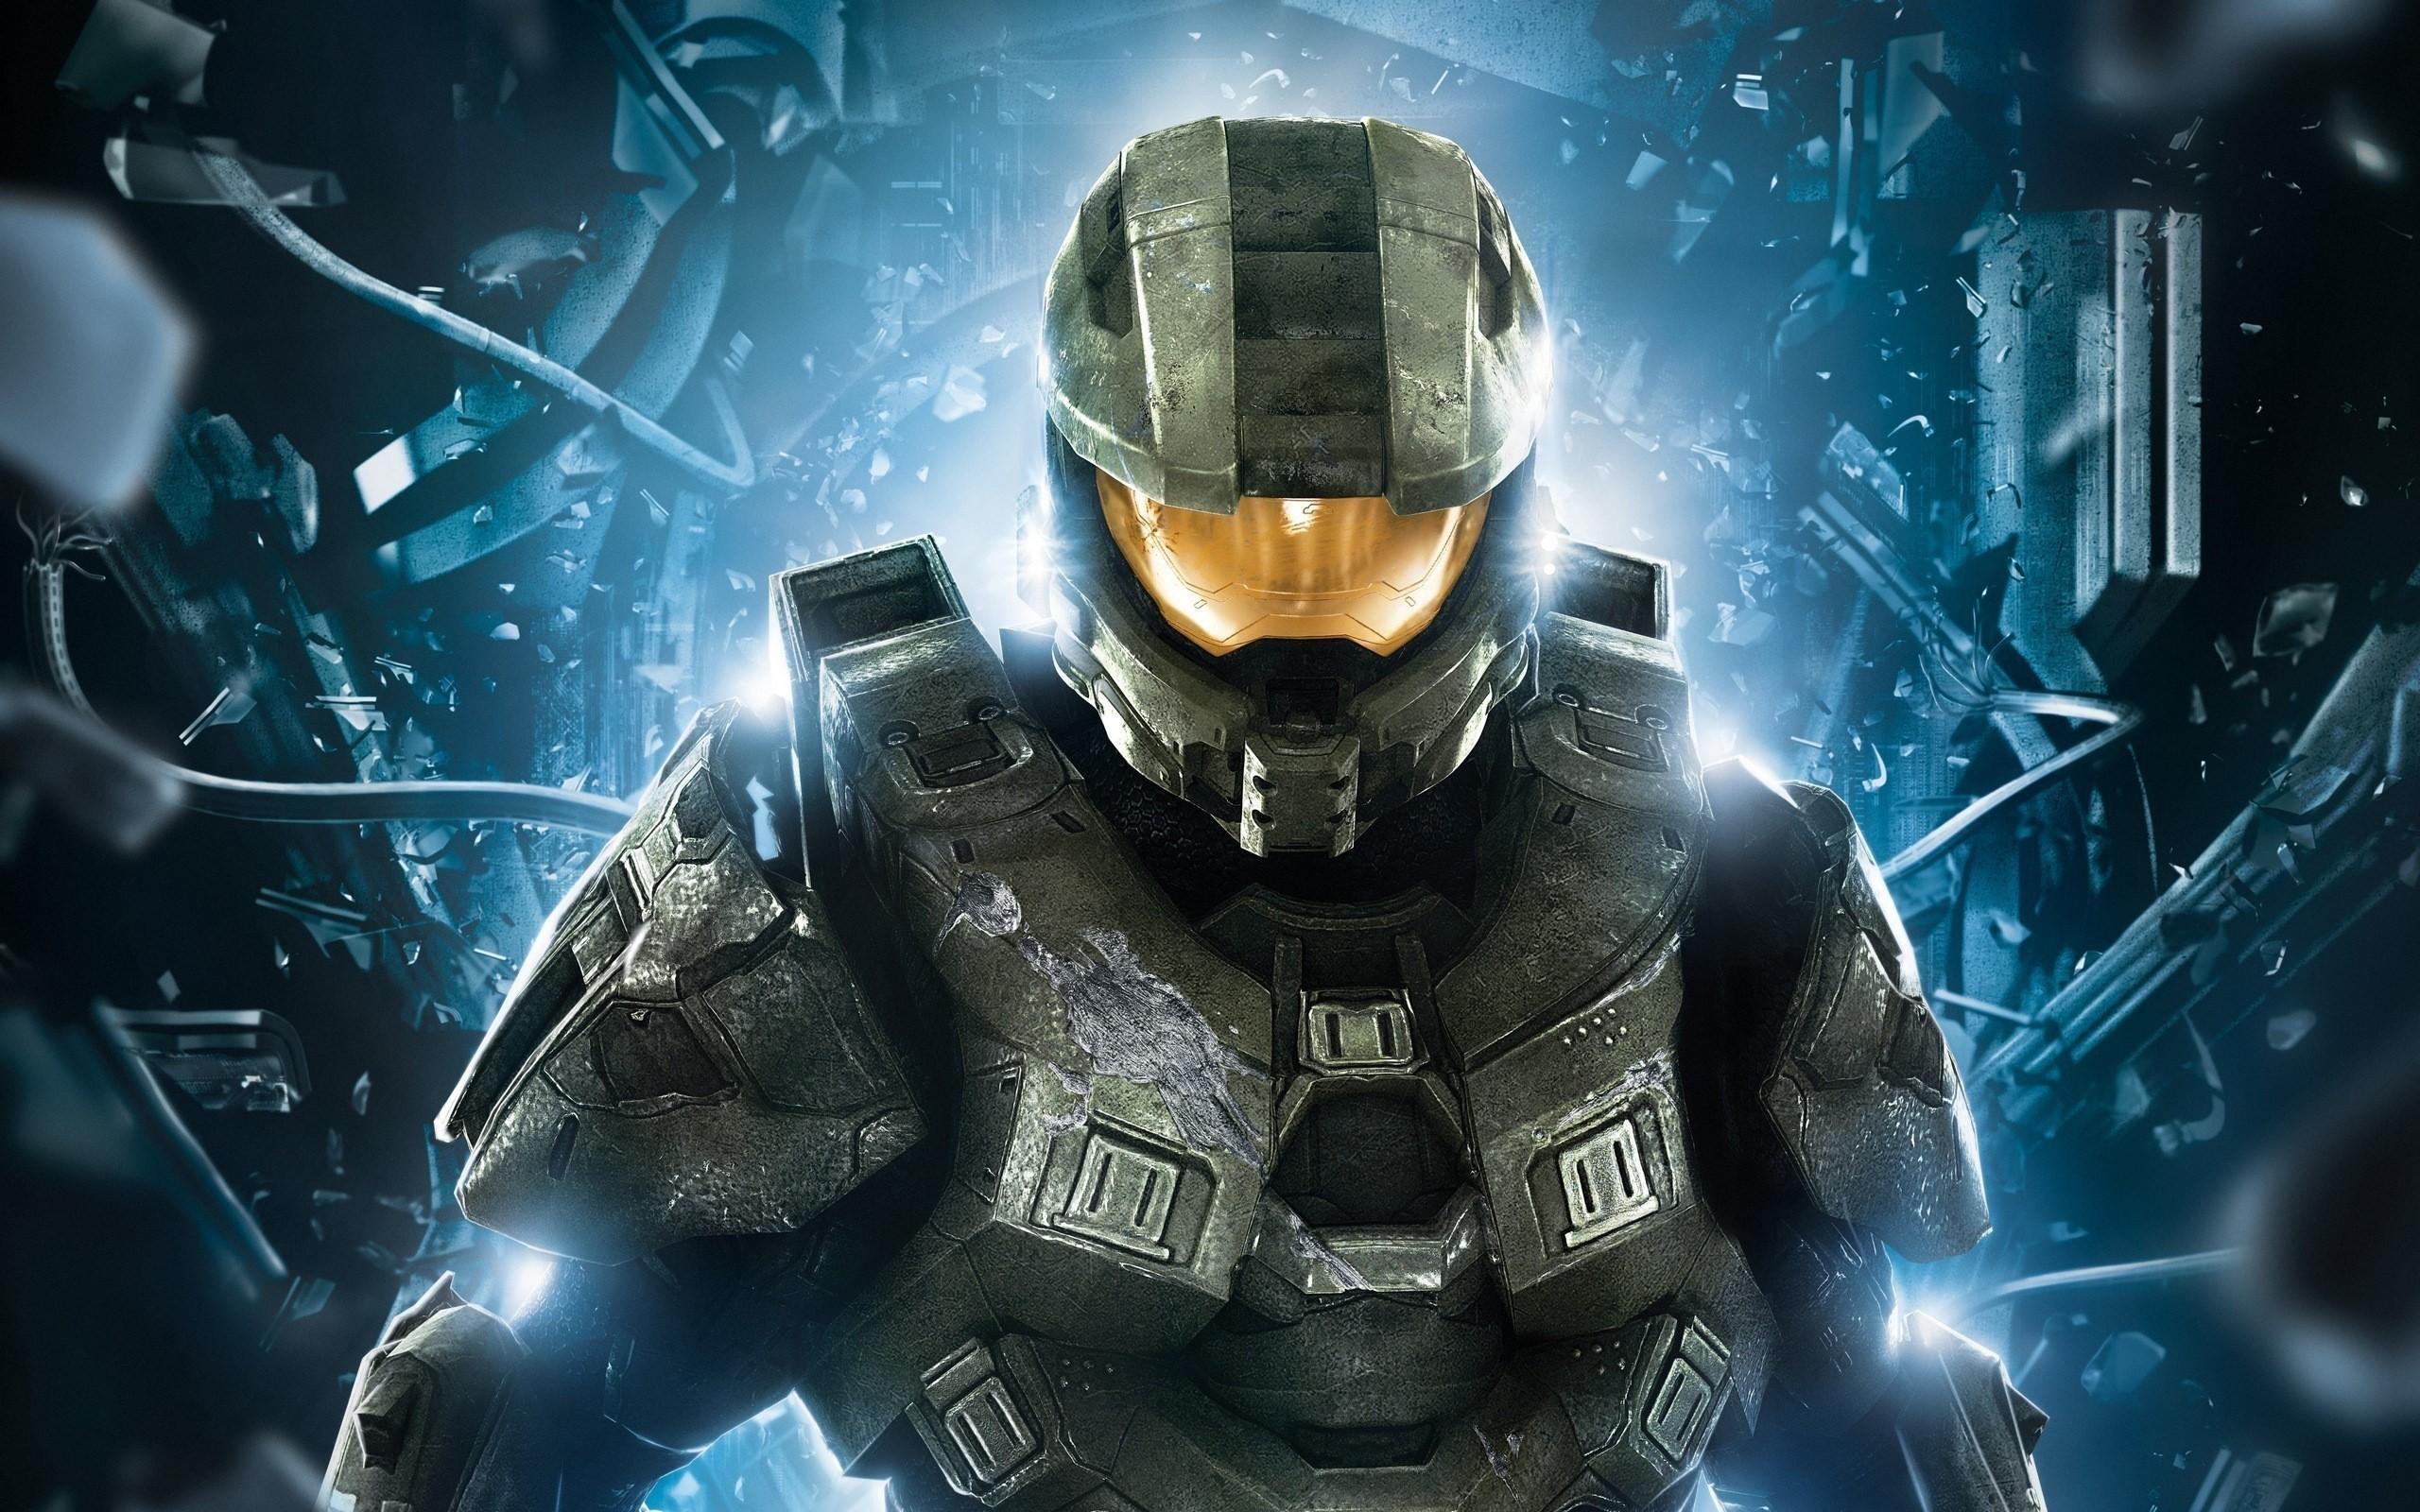 Halo 5 Master Chief Wallpaper Downloads